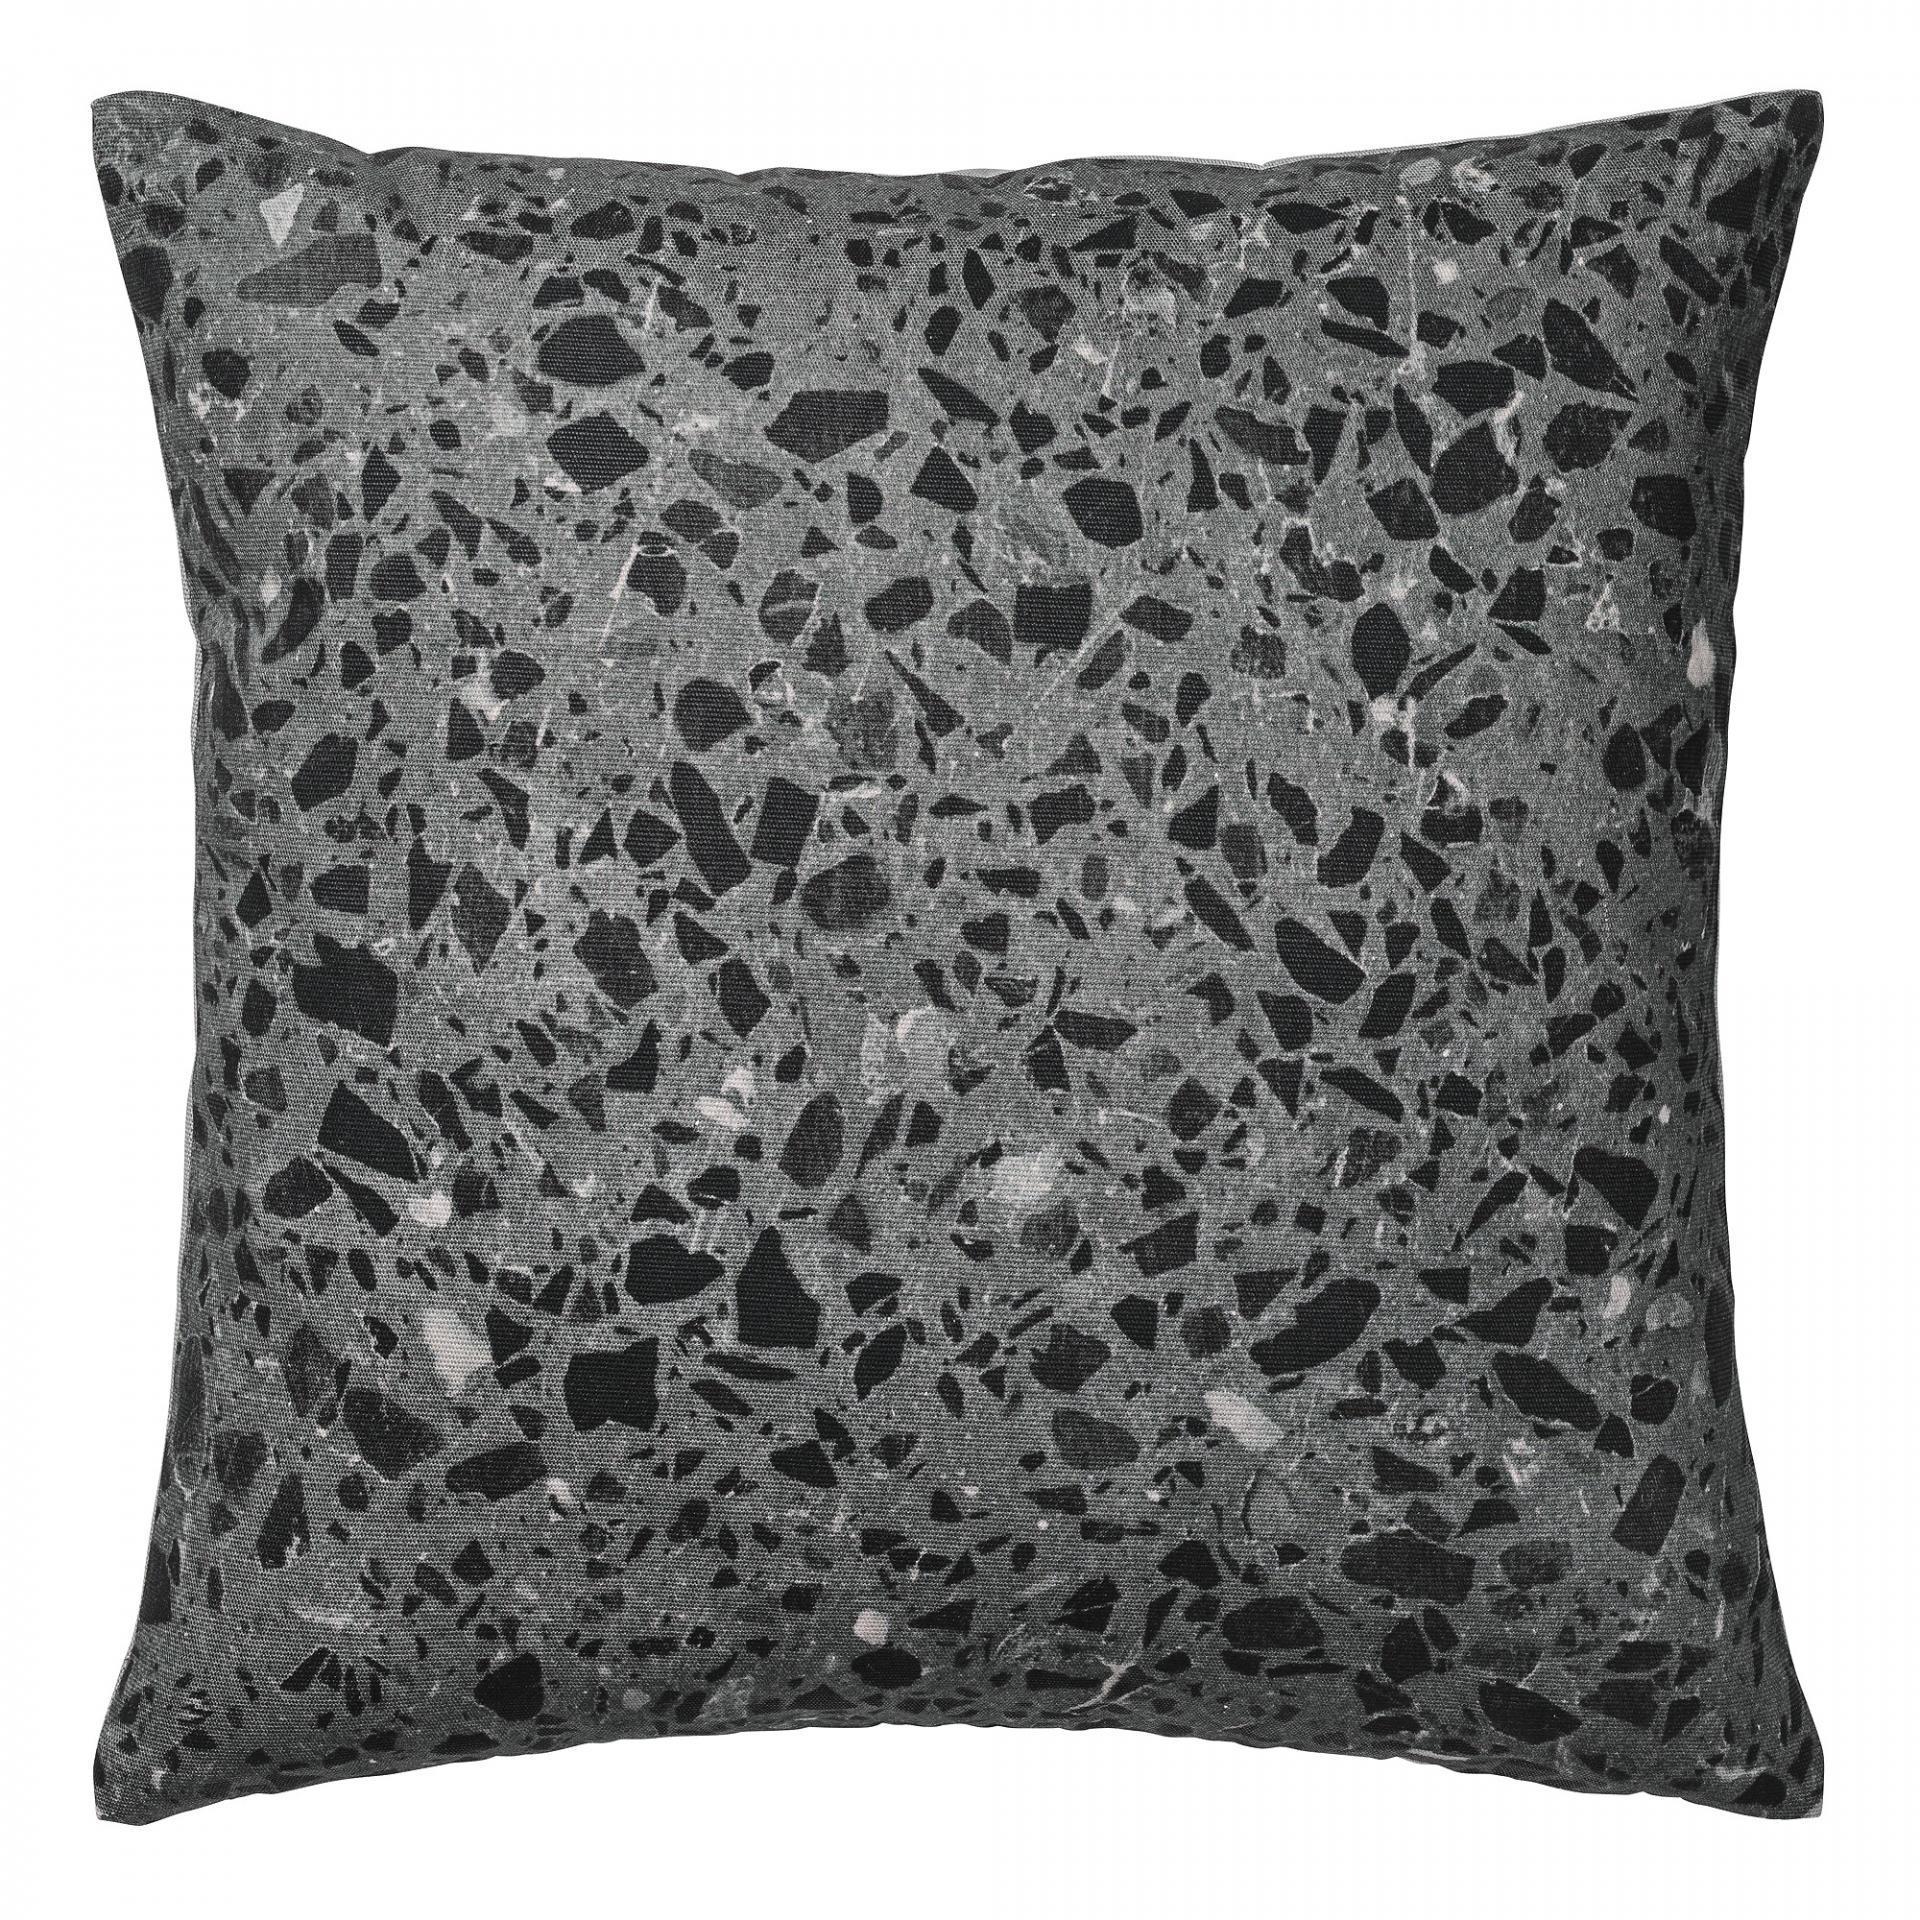 Bloomingville Polštář Terrazzo black 45x45 cm, šedá barva, černá barva, textil